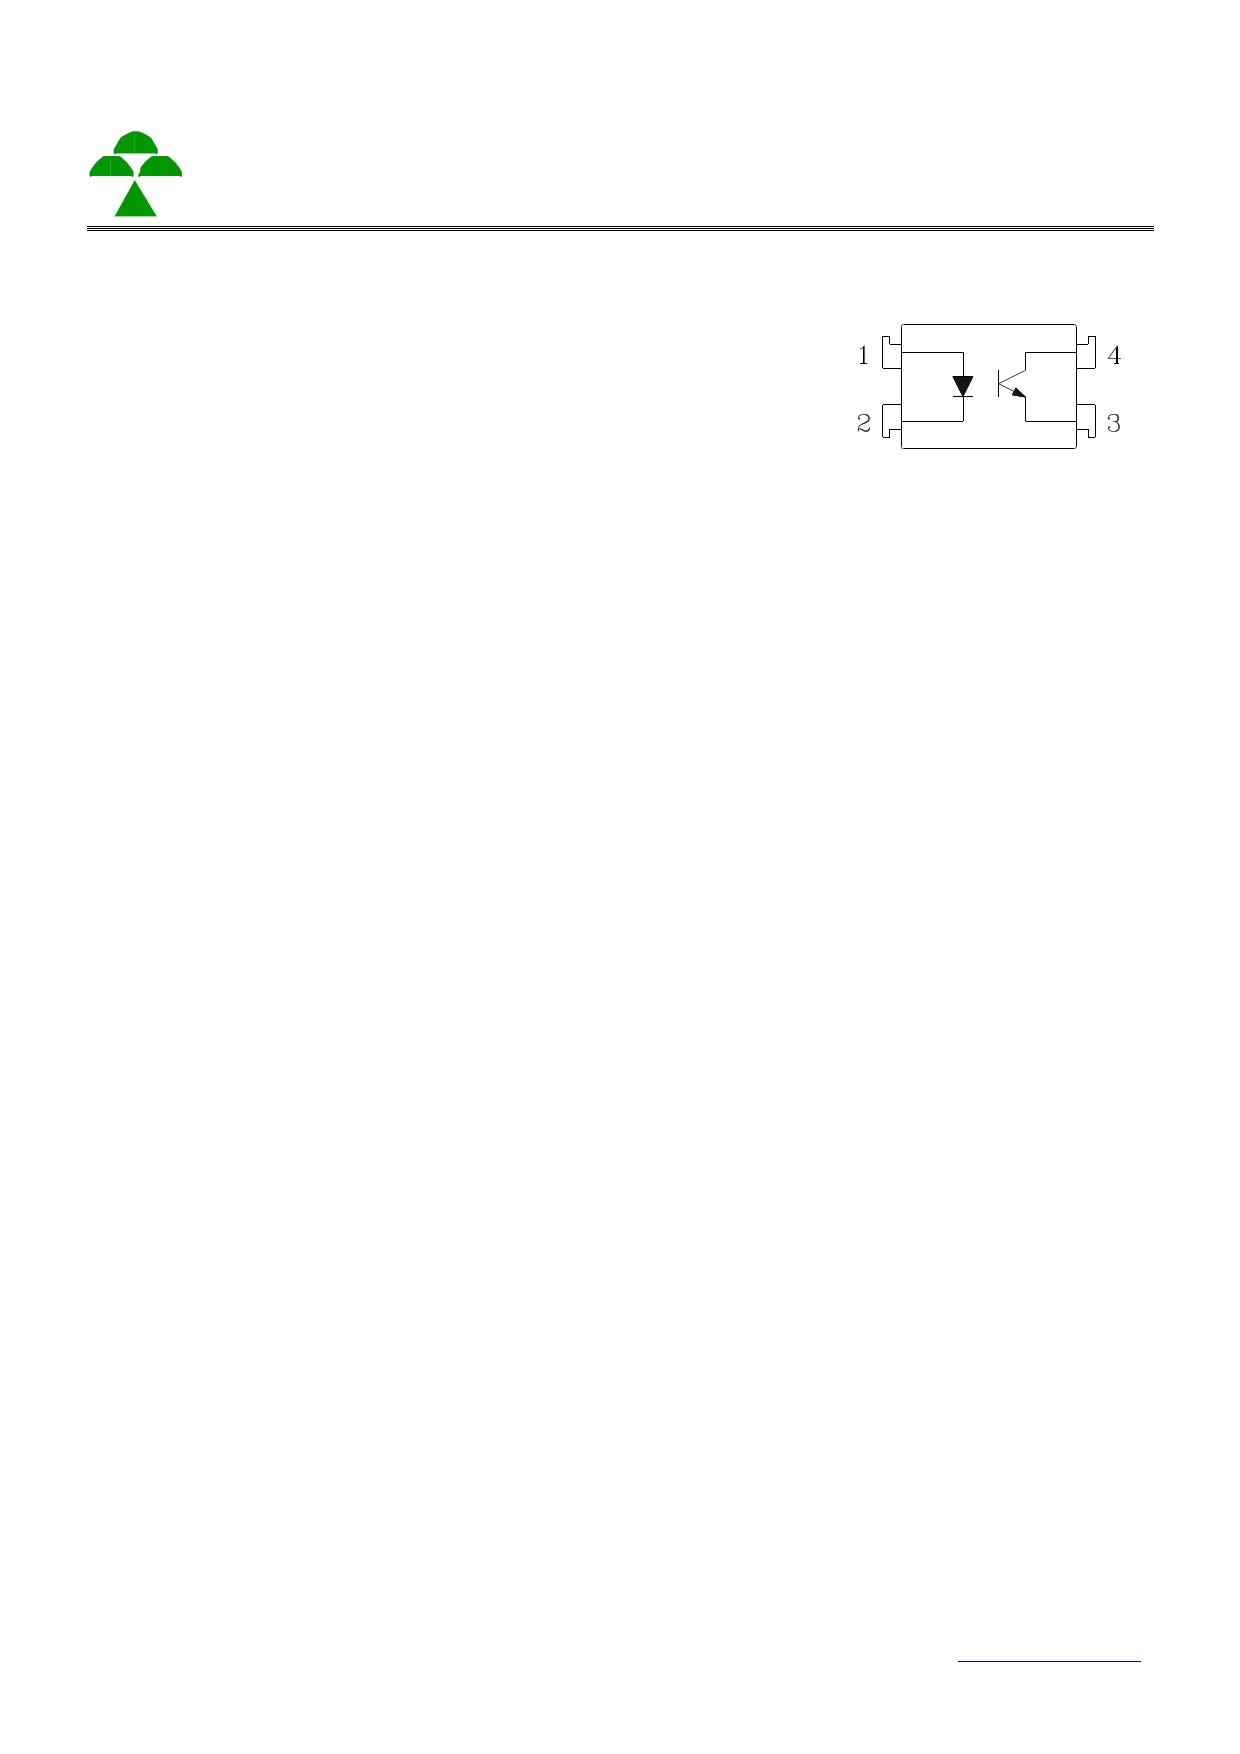 K10104X datasheet